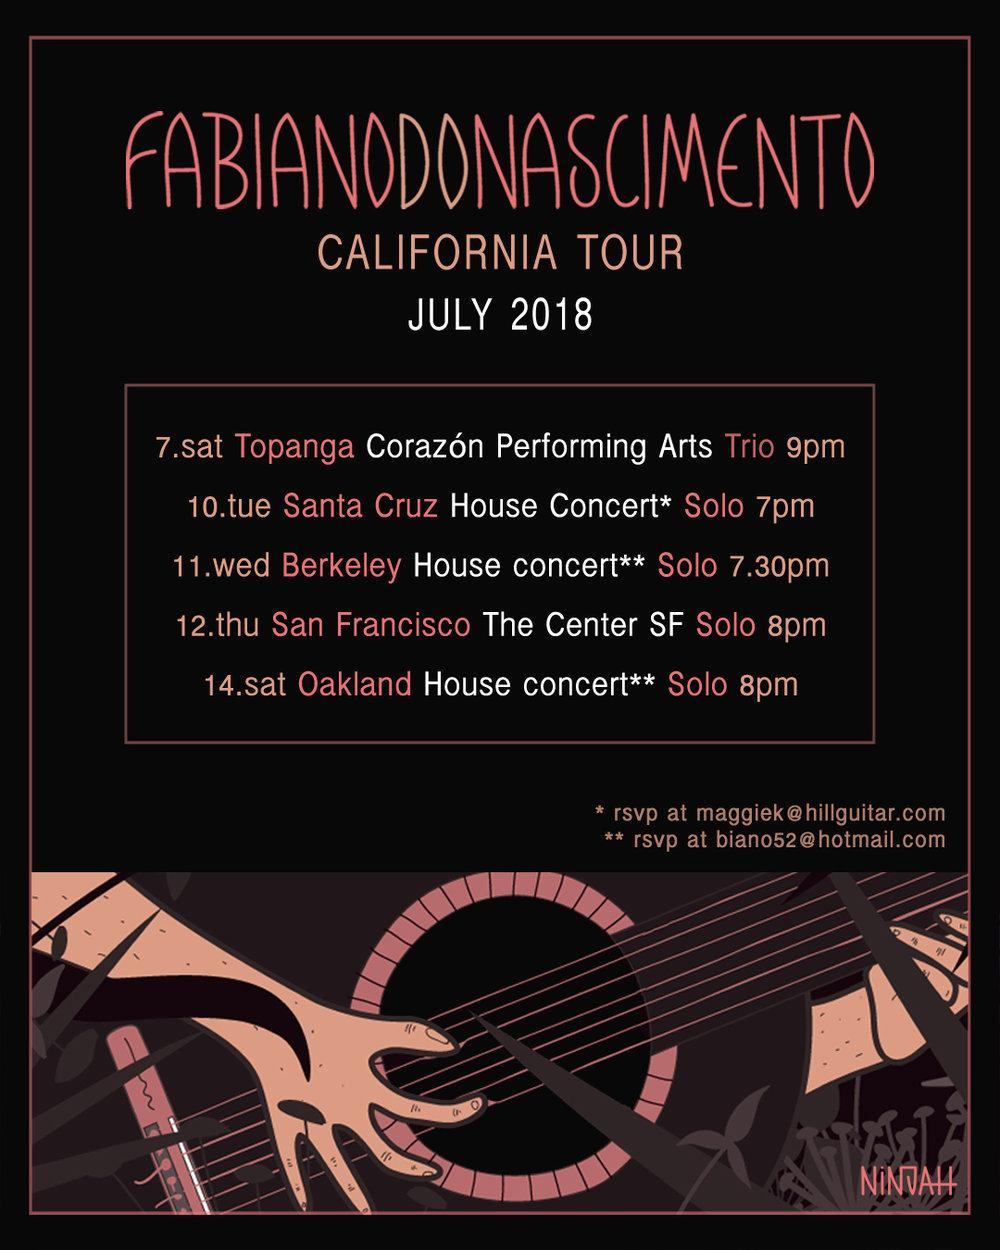 Fabi Tour California jul 2018.jpg